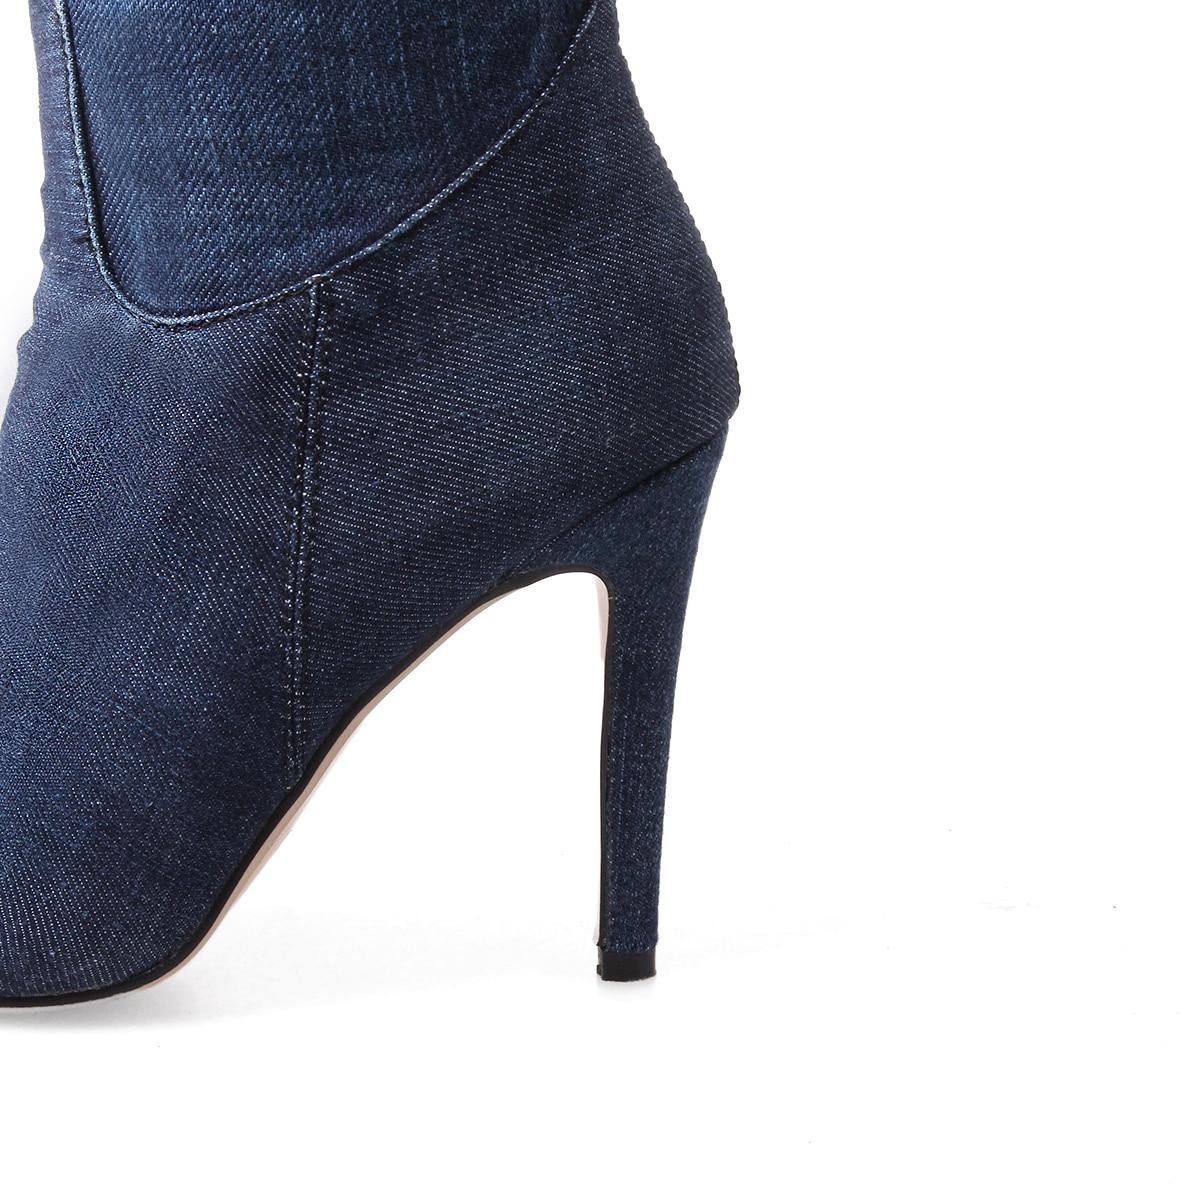 QZYERAI autumn and winter the ladies are high heel denim over knees boots European sexy womens shoes high heels and womens boots